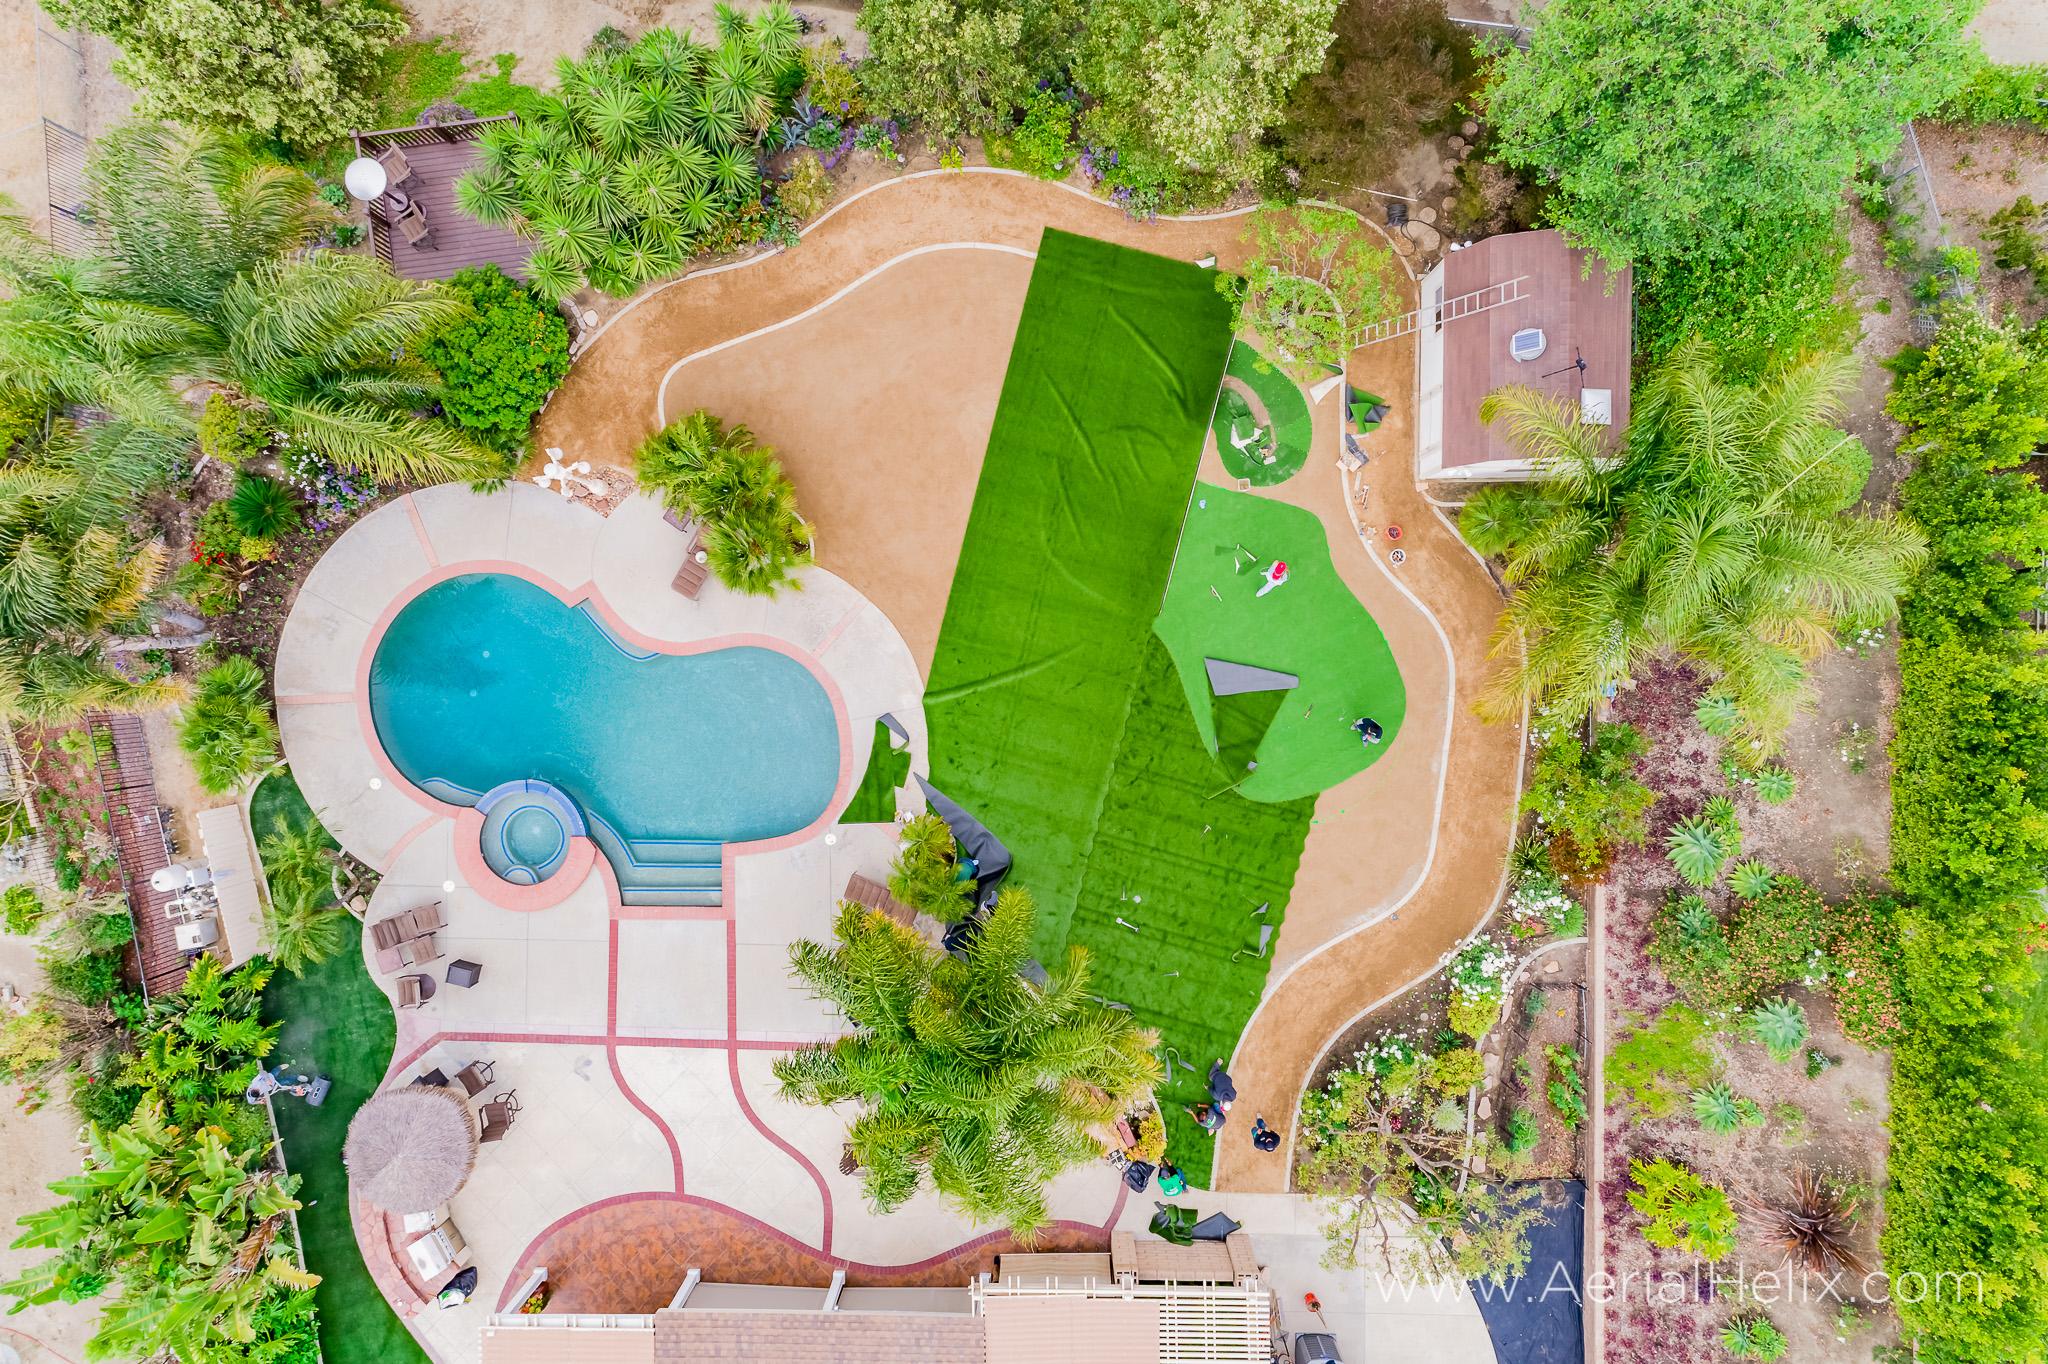 Joe Grass Install Photos aerial-7.jpg